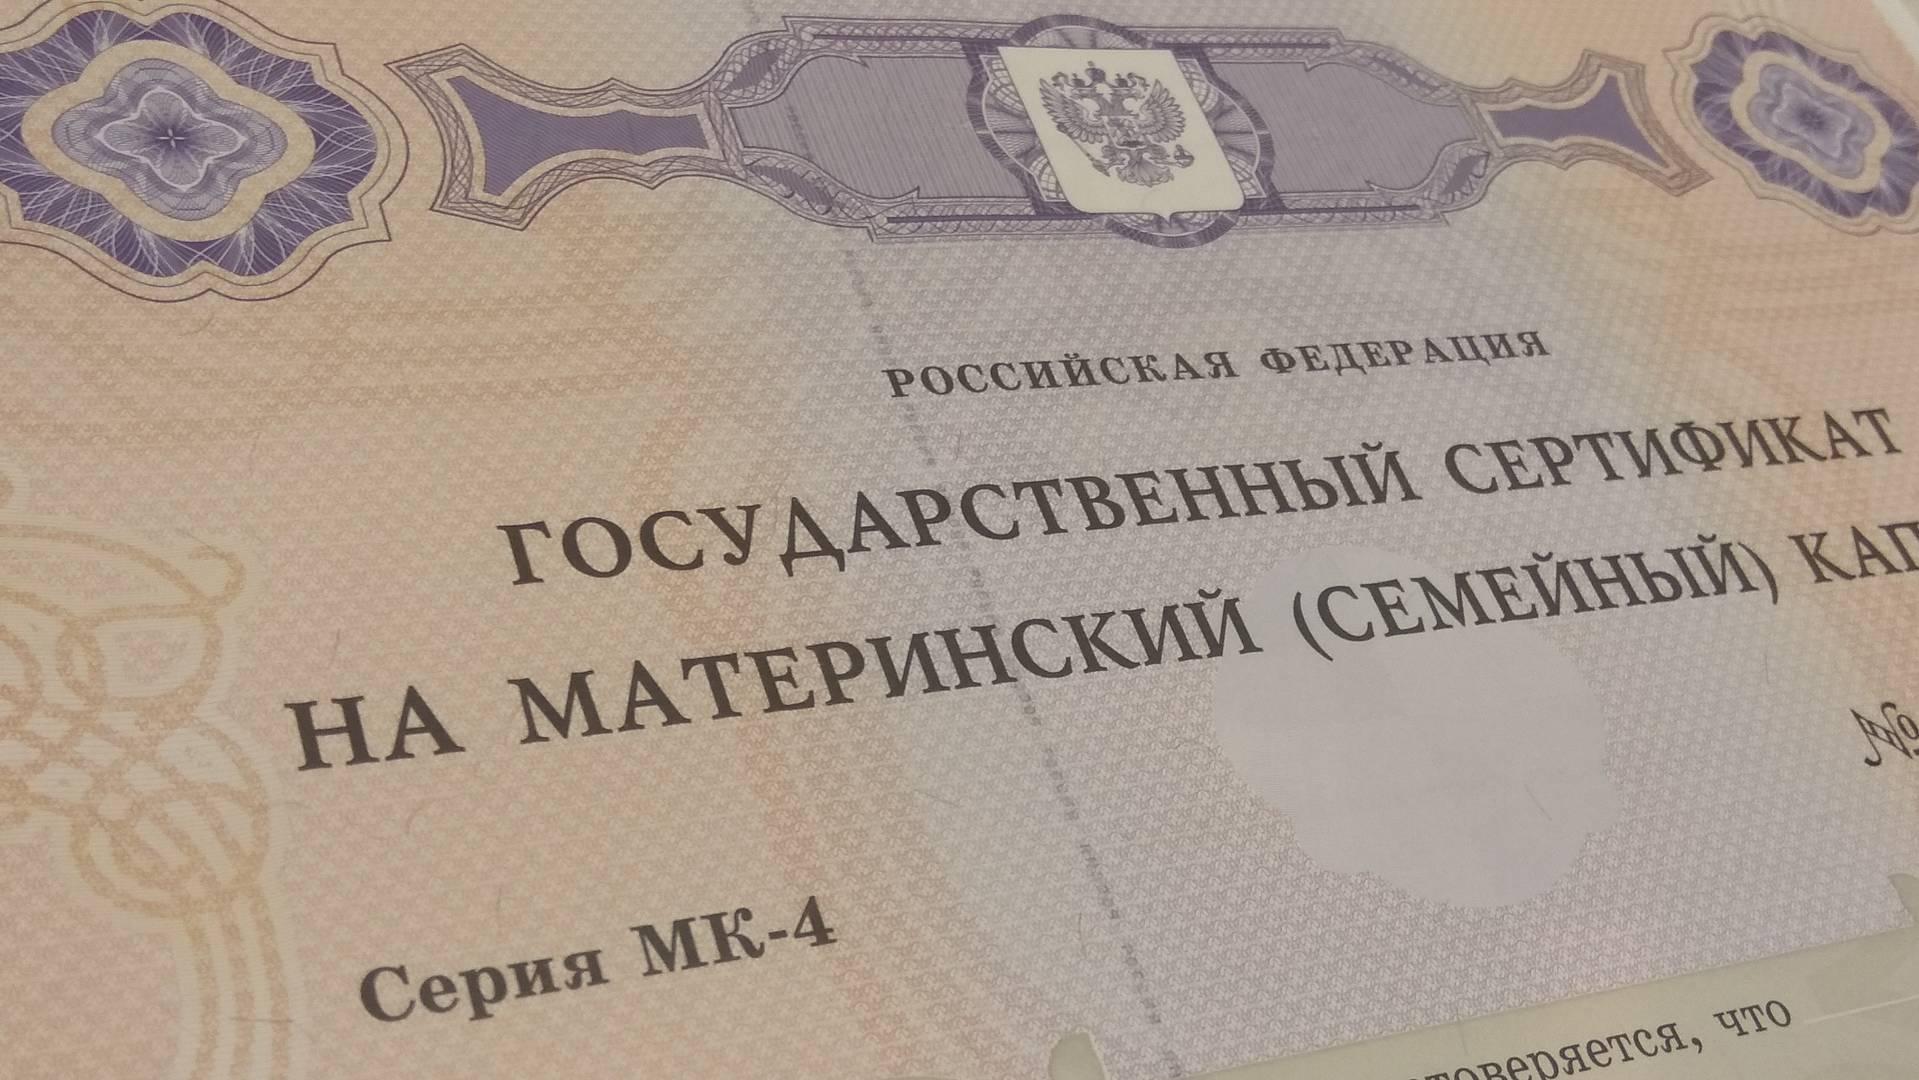 Сертификат на материнский капитал Дмитрий Новиков © ИА Красная Весна